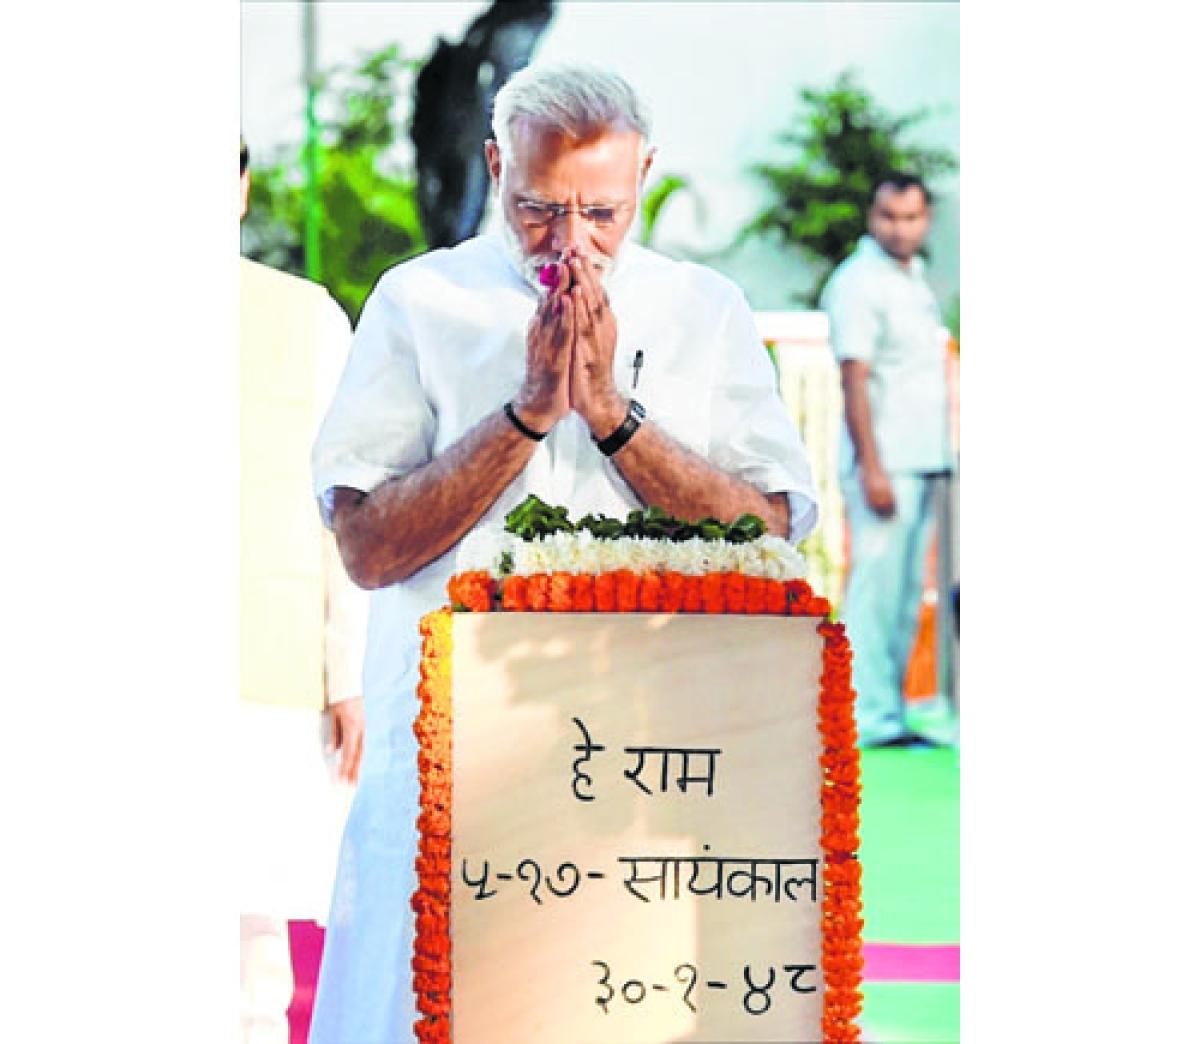 New Delhi:  Prime Minister Narendra Modi paying tribute at Mahatma Gandhi's memorial on his 148th birth anniversary at Gandhi Smriti in New Delhi on Monday. PTI Photo by Kamal Singh(PTI10_2_2017_000167B)